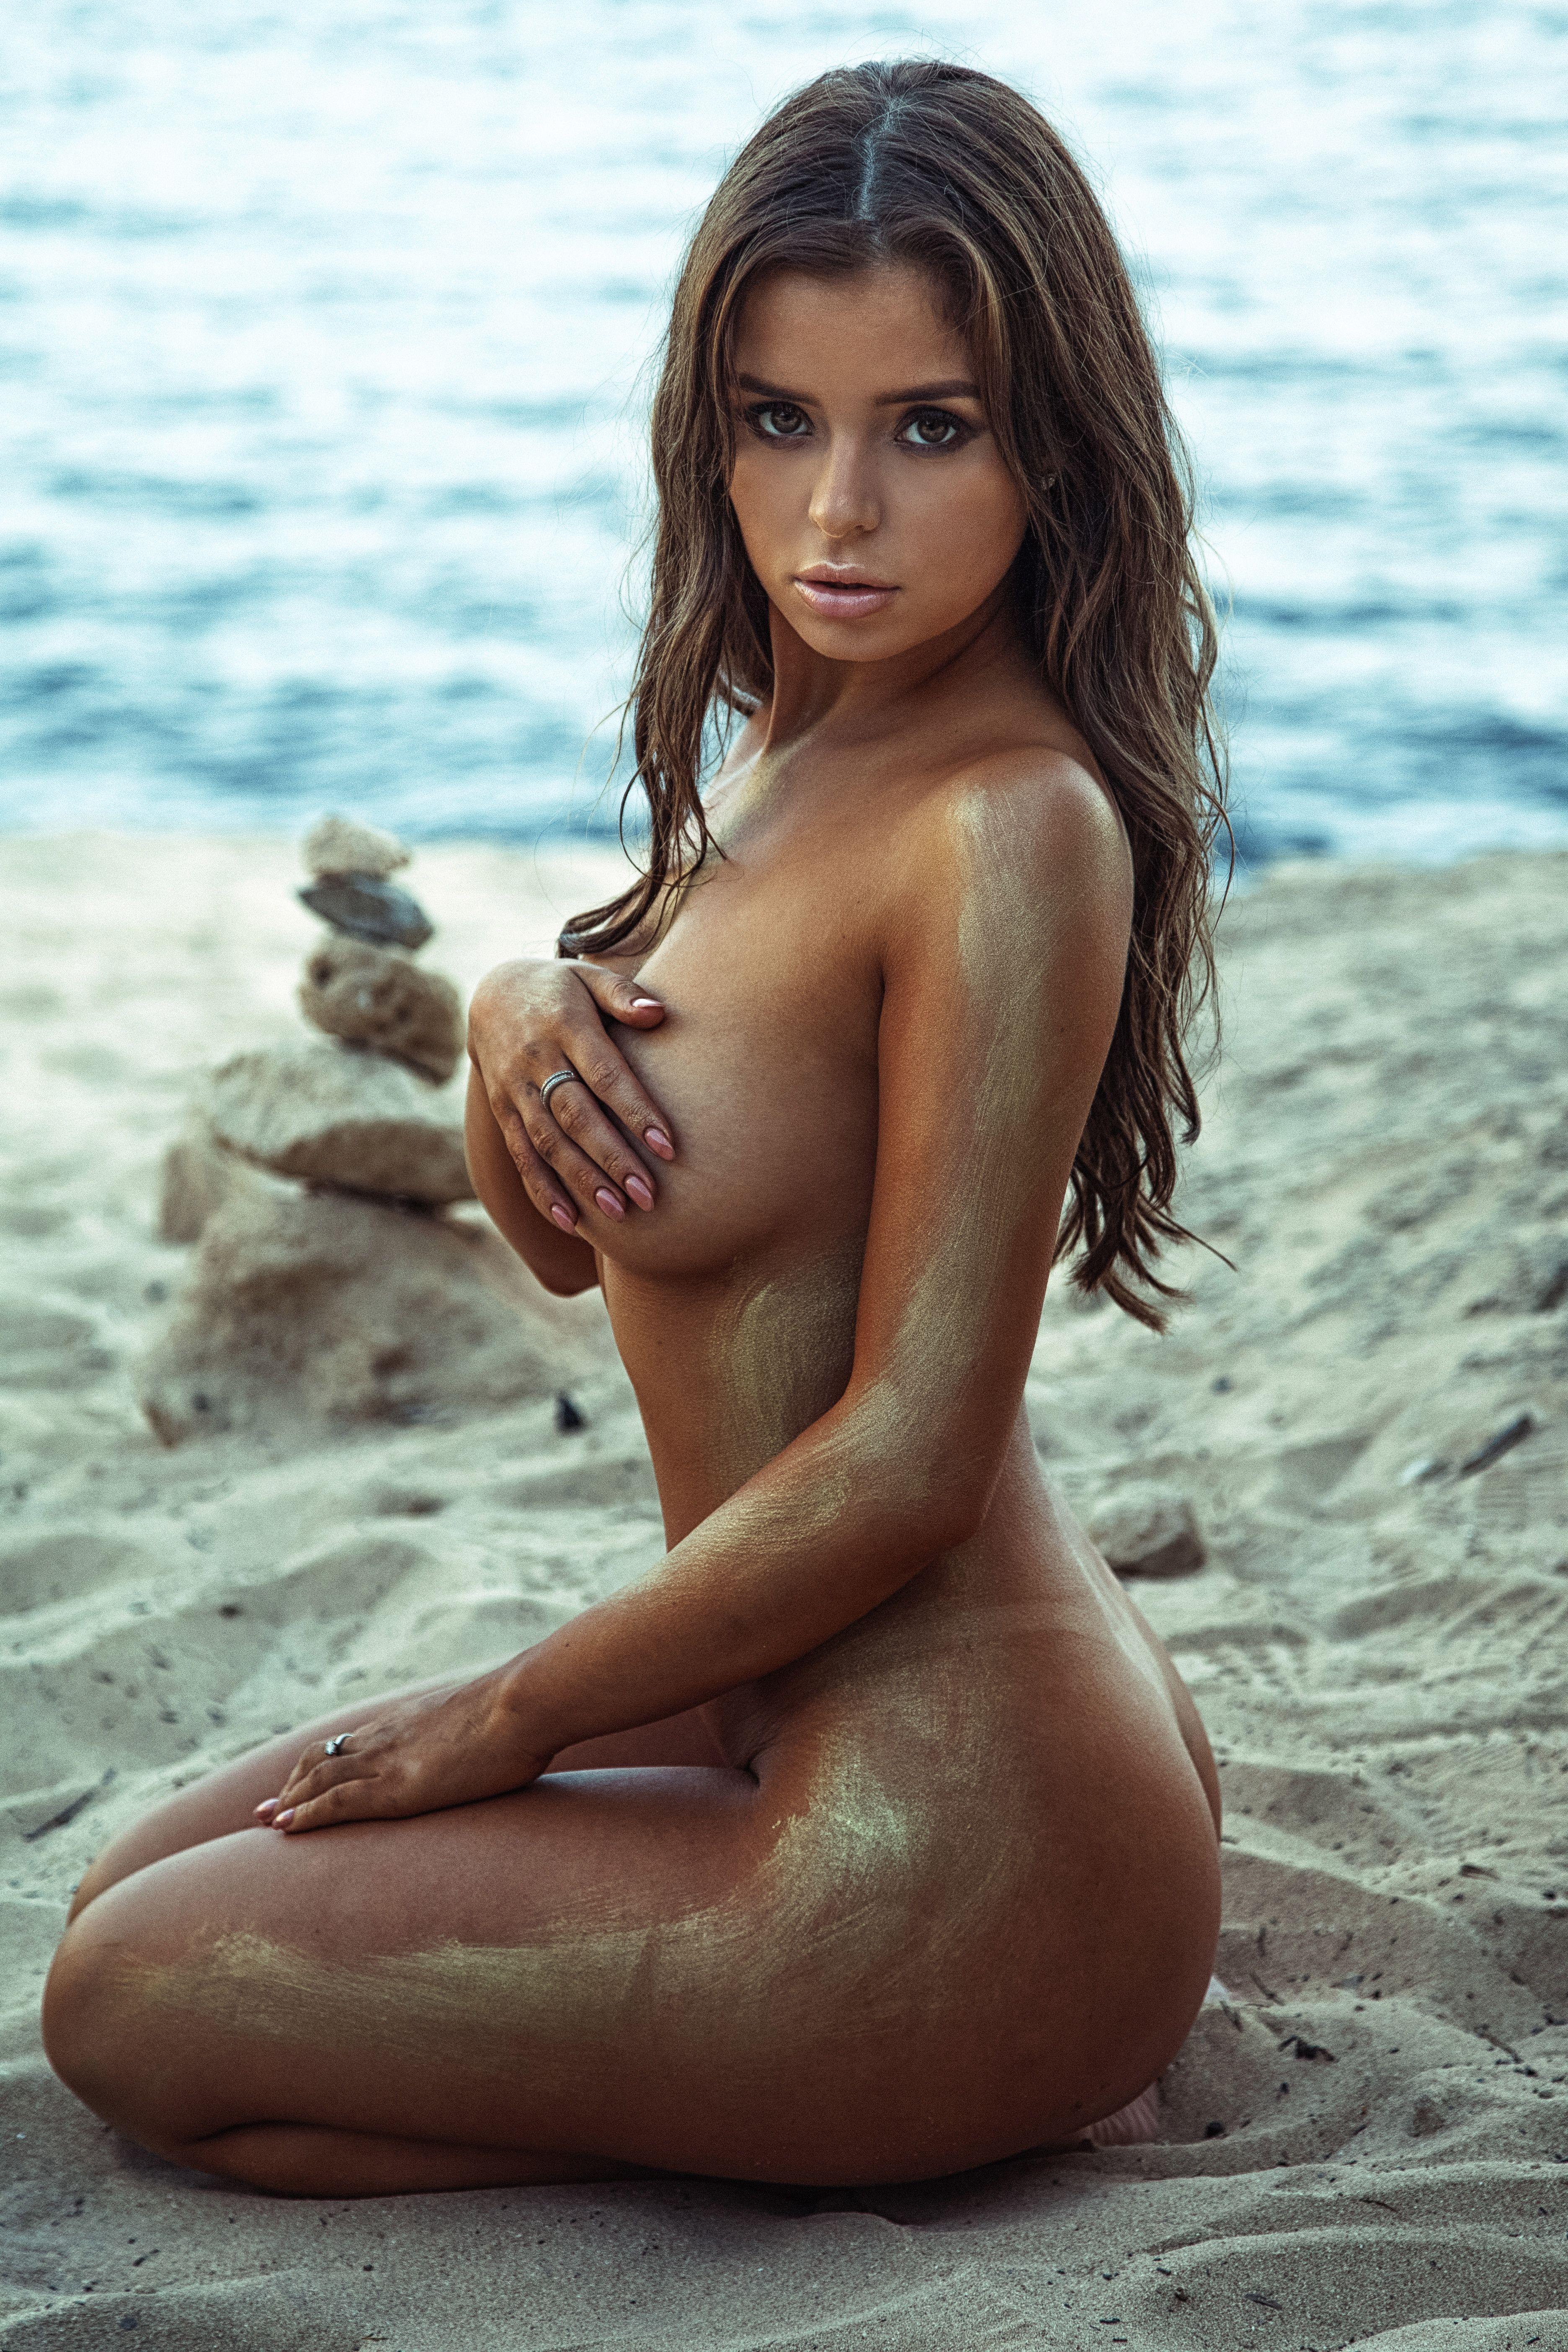 https://img7.hotnessrater.com/4510366/demi-rose-mawby-topless.jpg?w=4000&h=6000